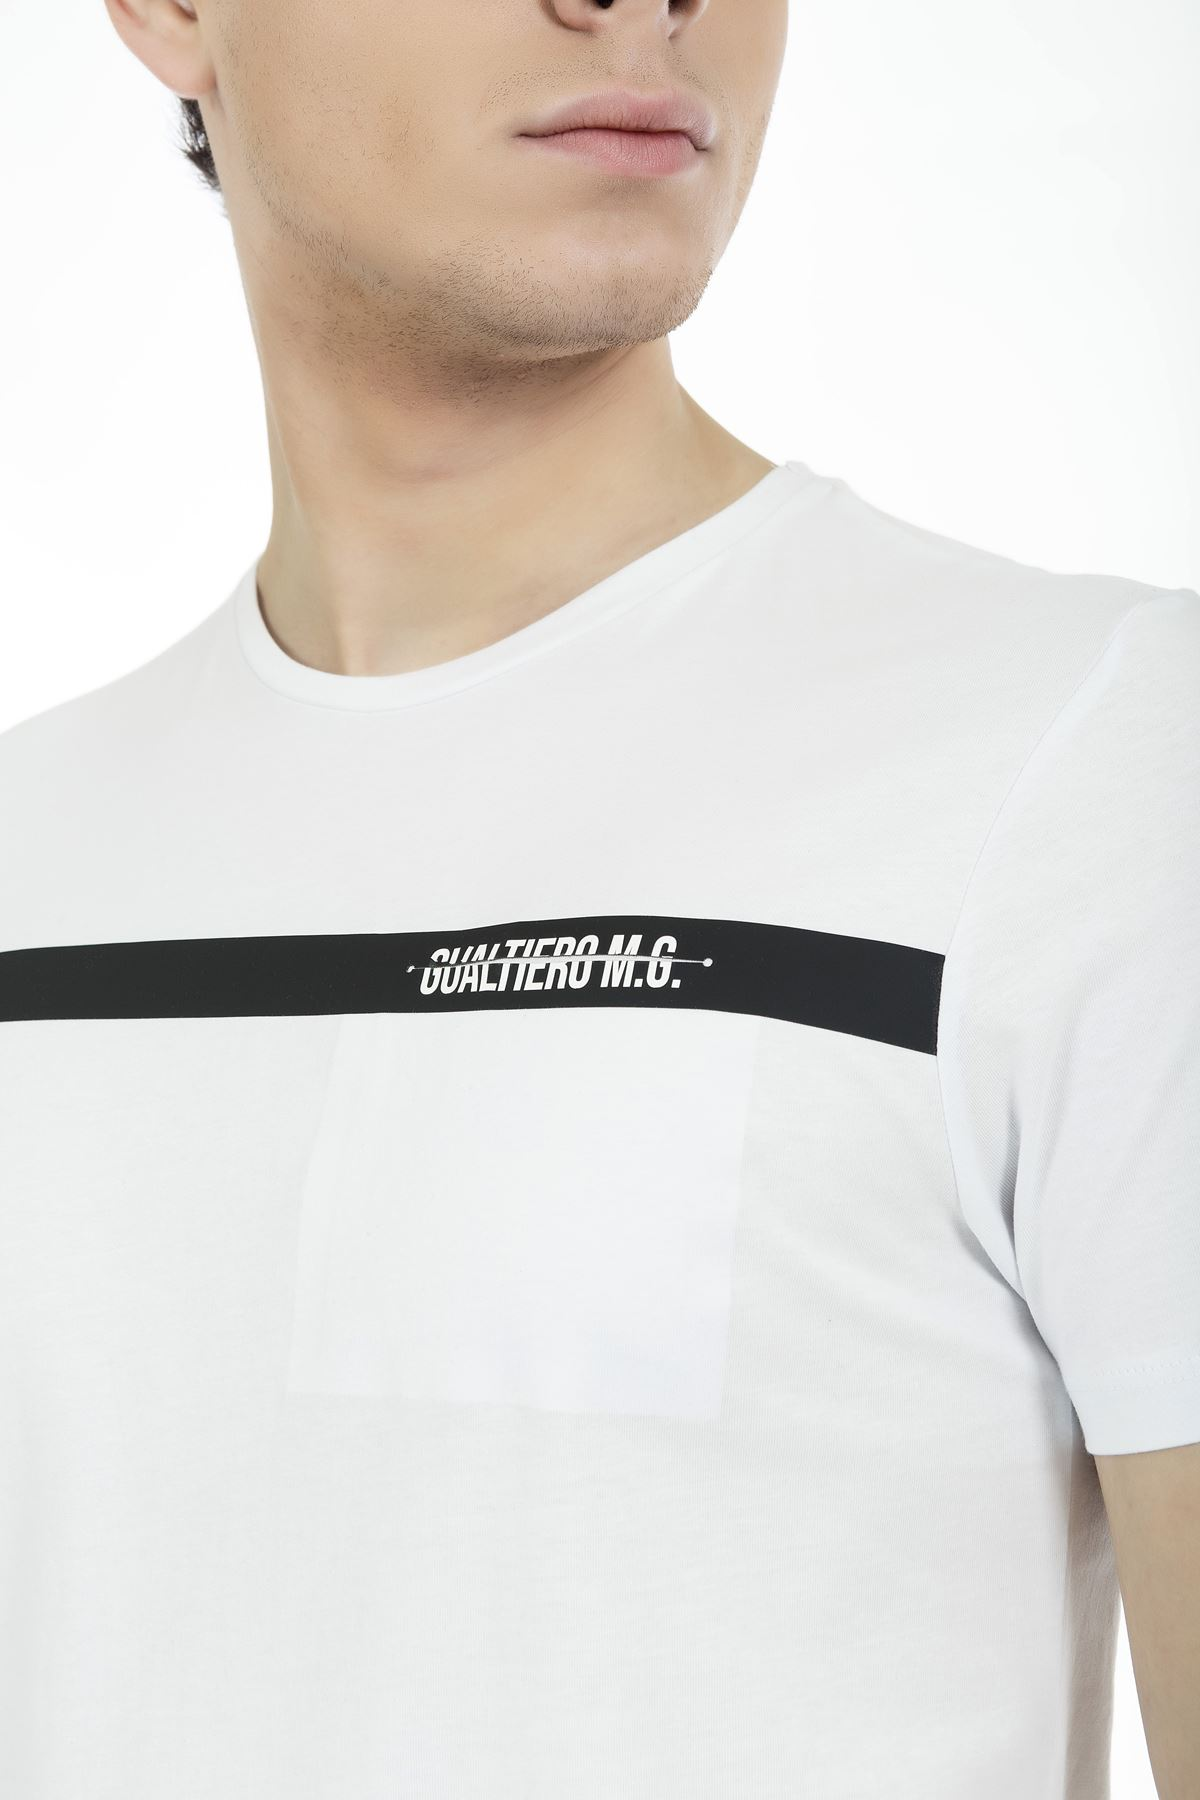 Beyaz-Siyah Bisiklet Yaka Kısa Kol Göğüs Cepli Baskılı Tshirt